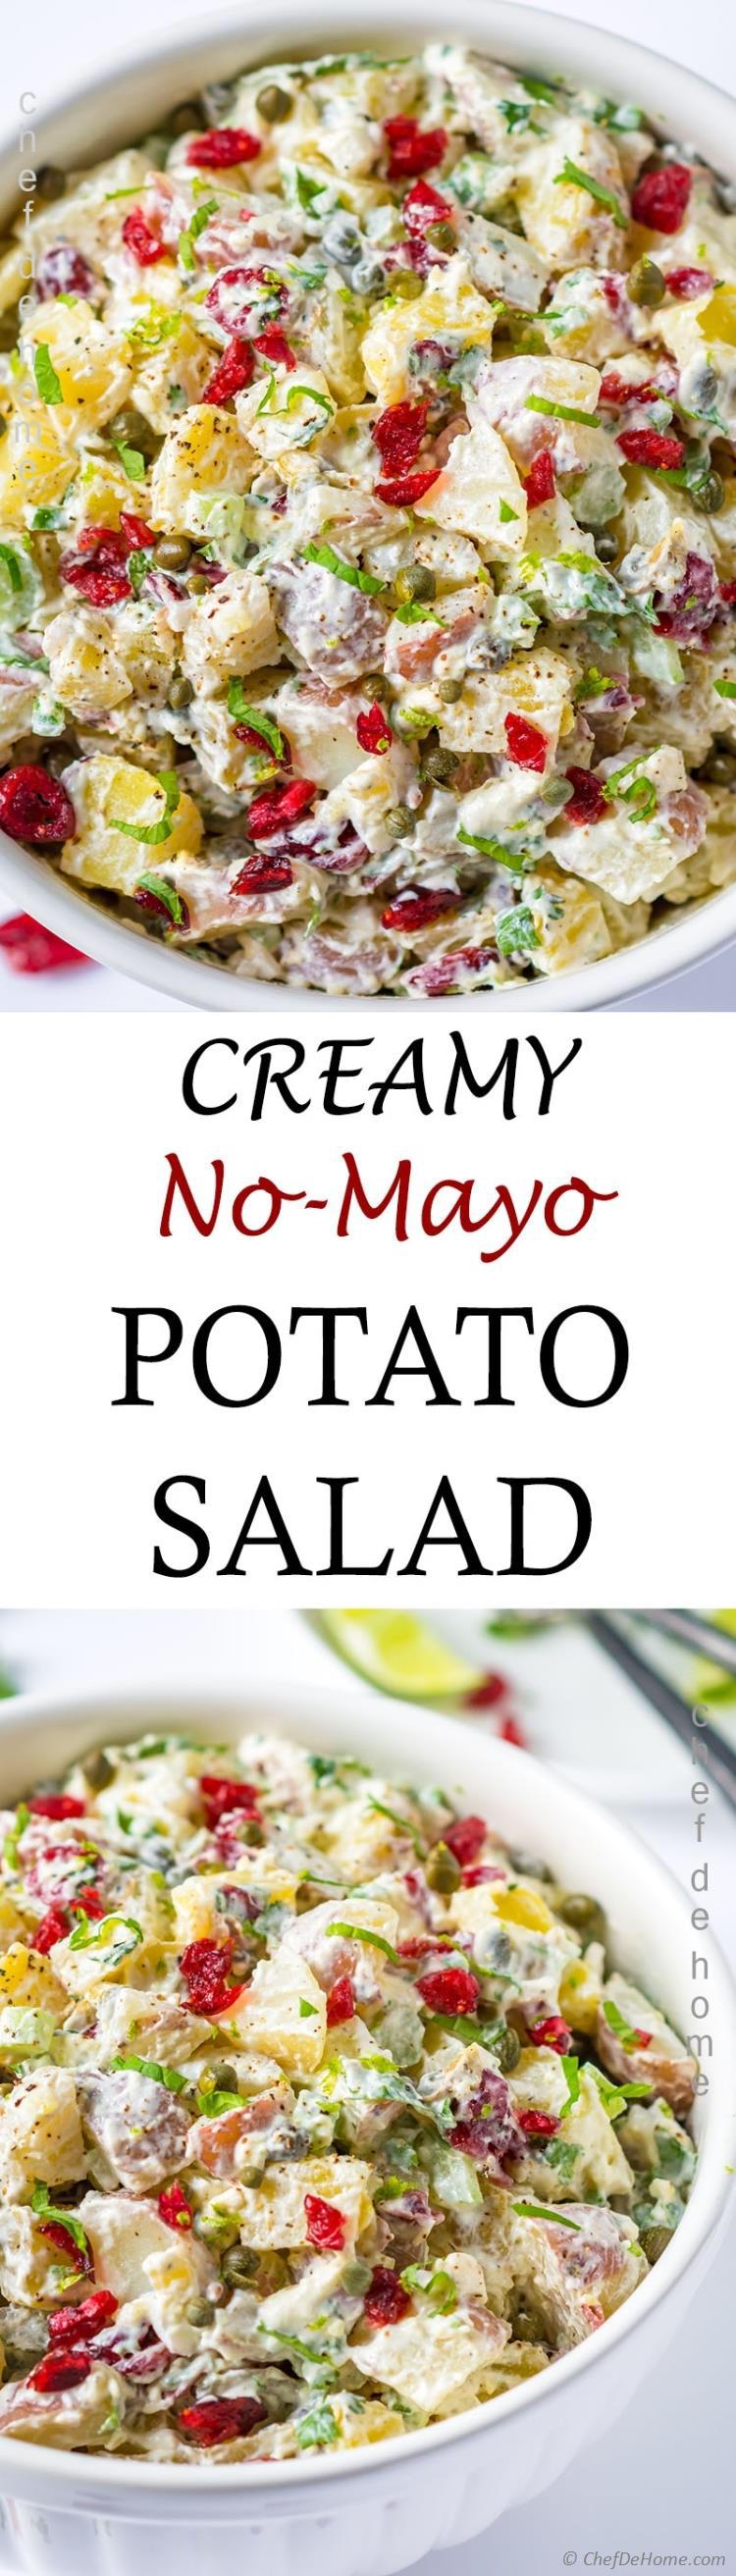 Recipe For Creamy Potato Salad Without Mayo Simple Easy And Ridiculously Creamy Potato Salad With Potato Salad Without Mayo Creamy Potato Salad Potato Salad